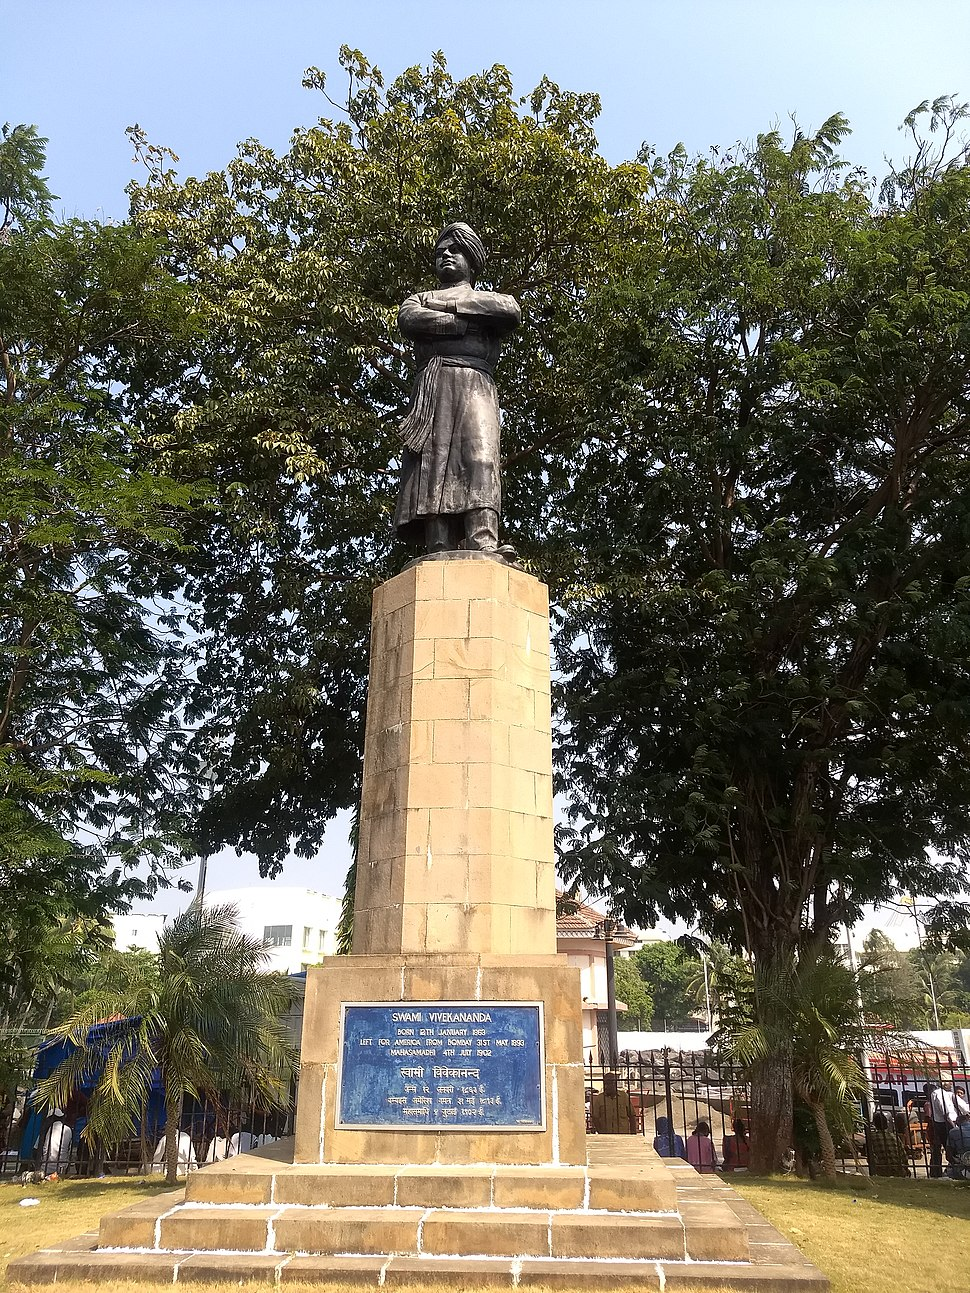 Statue of Swami Vivekananda (near Gateway of India)